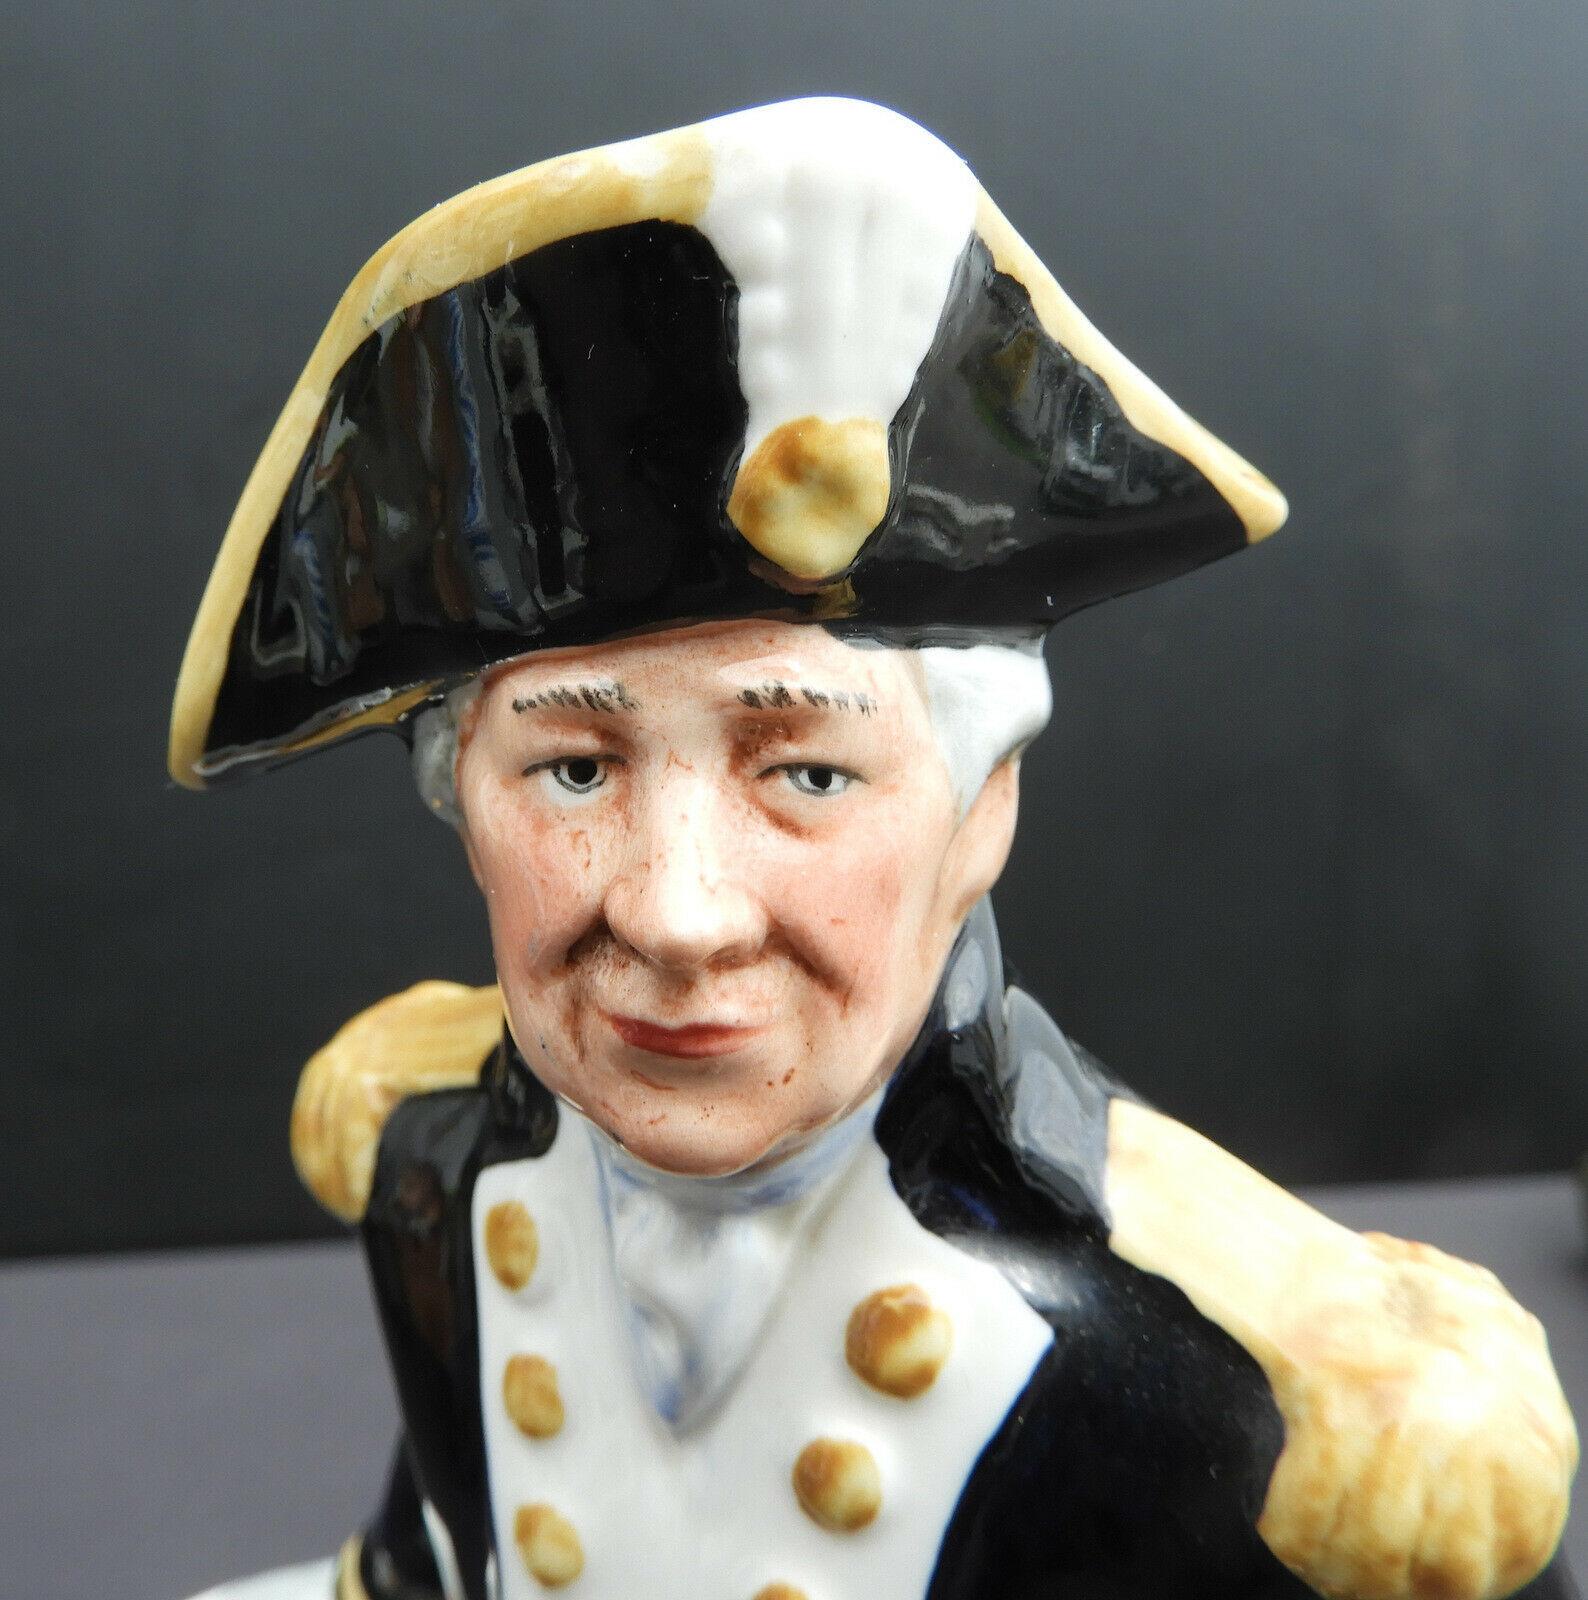 Royal Doulton Figurine - Sea Character Series - The Captain HN2260